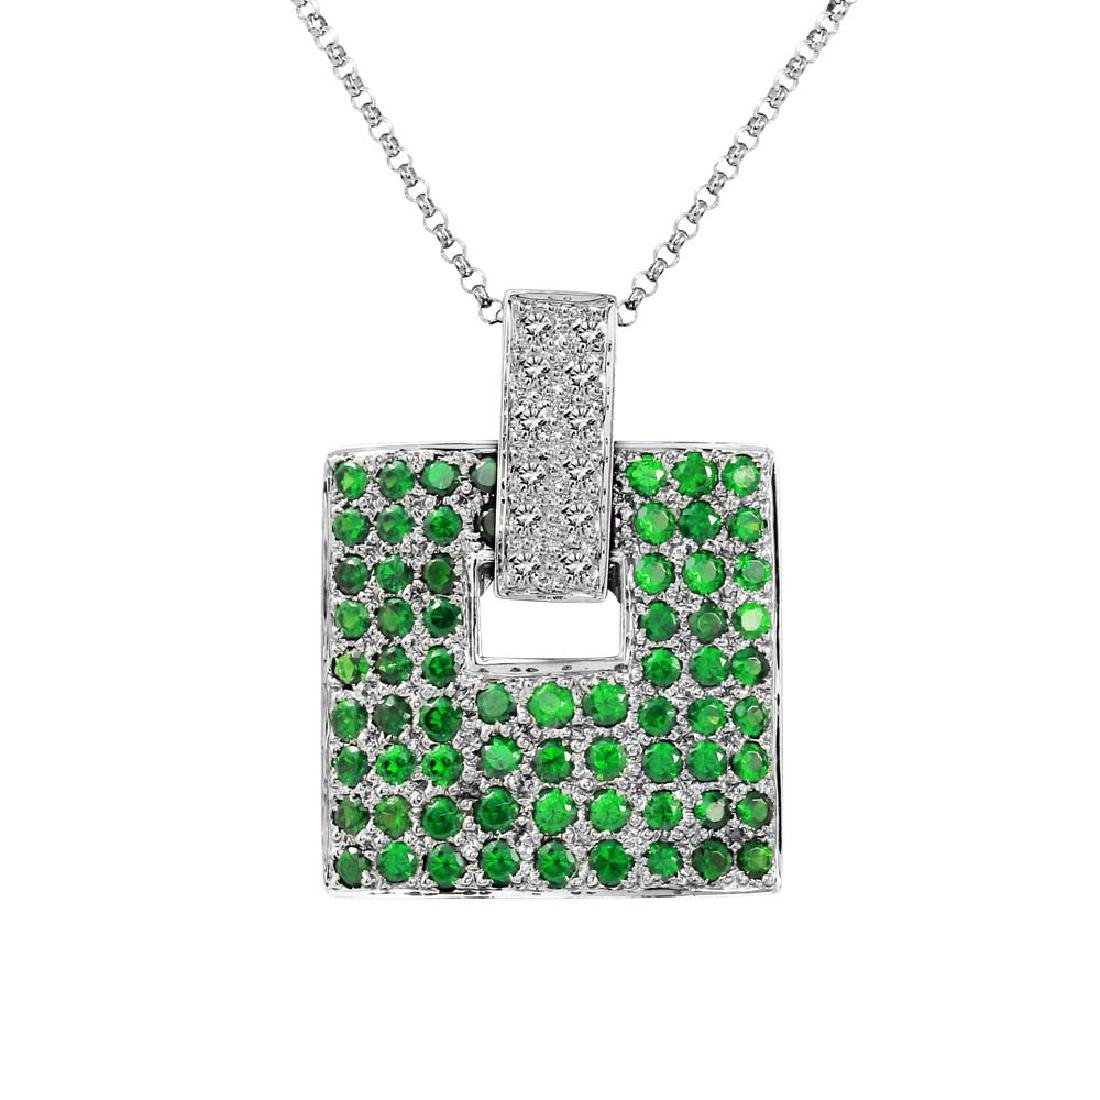 Genuine 2.02 TCW 14K White Gold Ladies Necklace